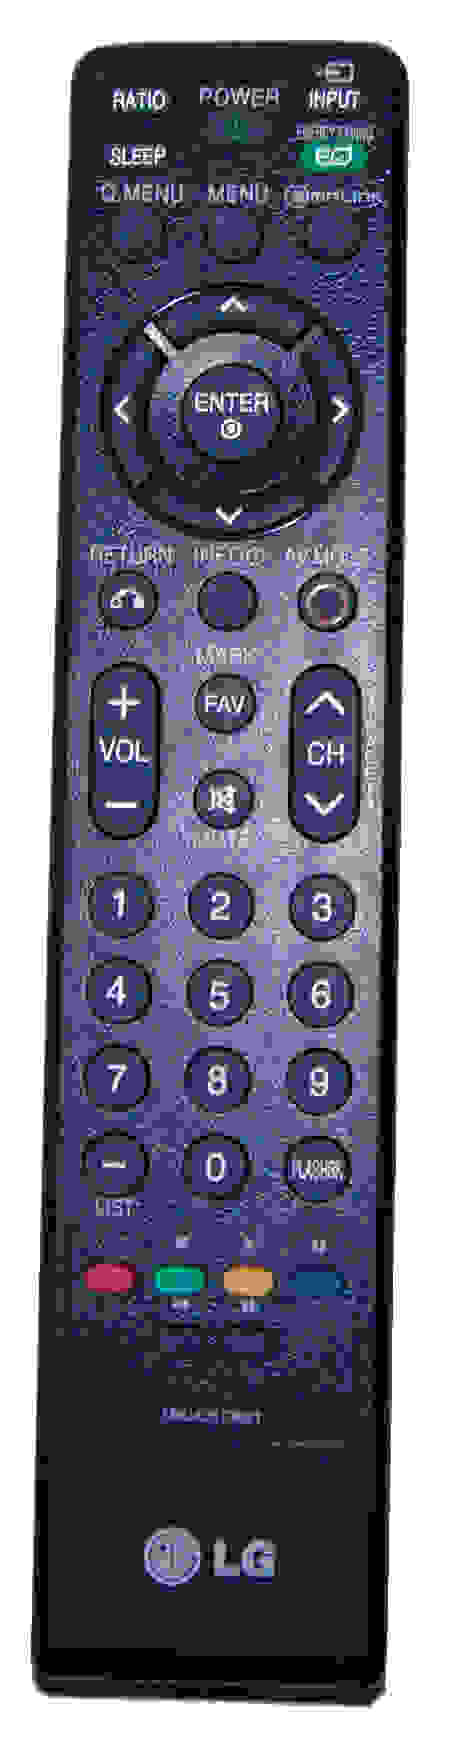 LG-32LH40-remote.jpg